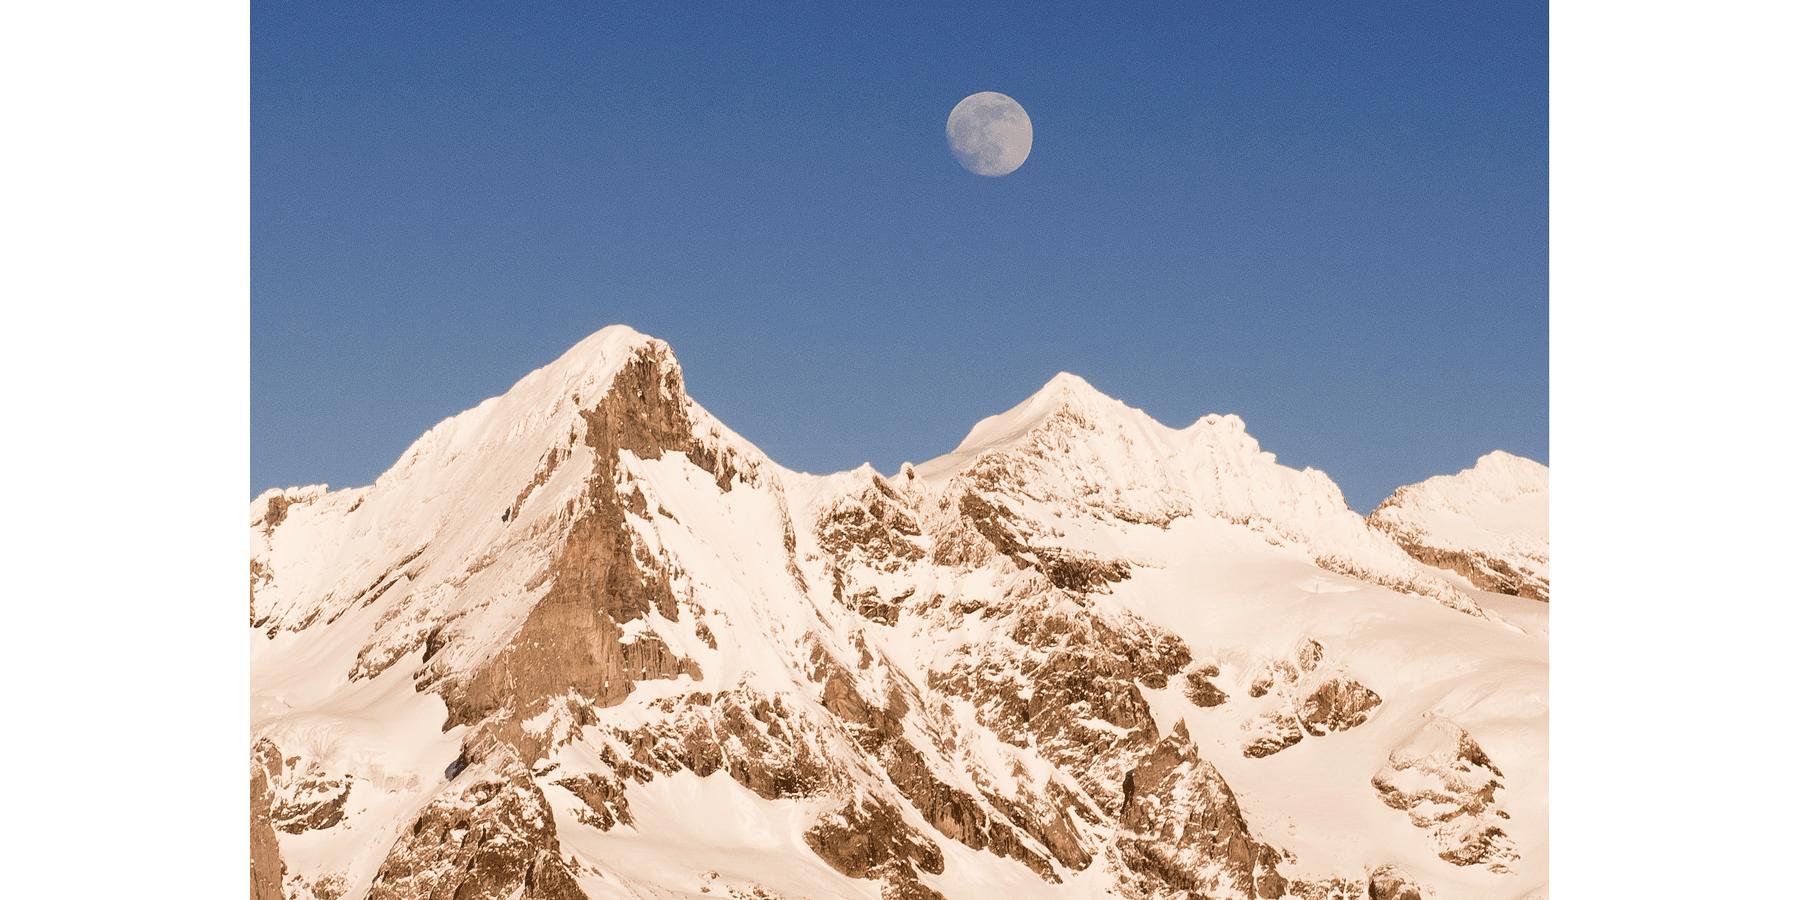 moon-wetterhorn-grindelwald